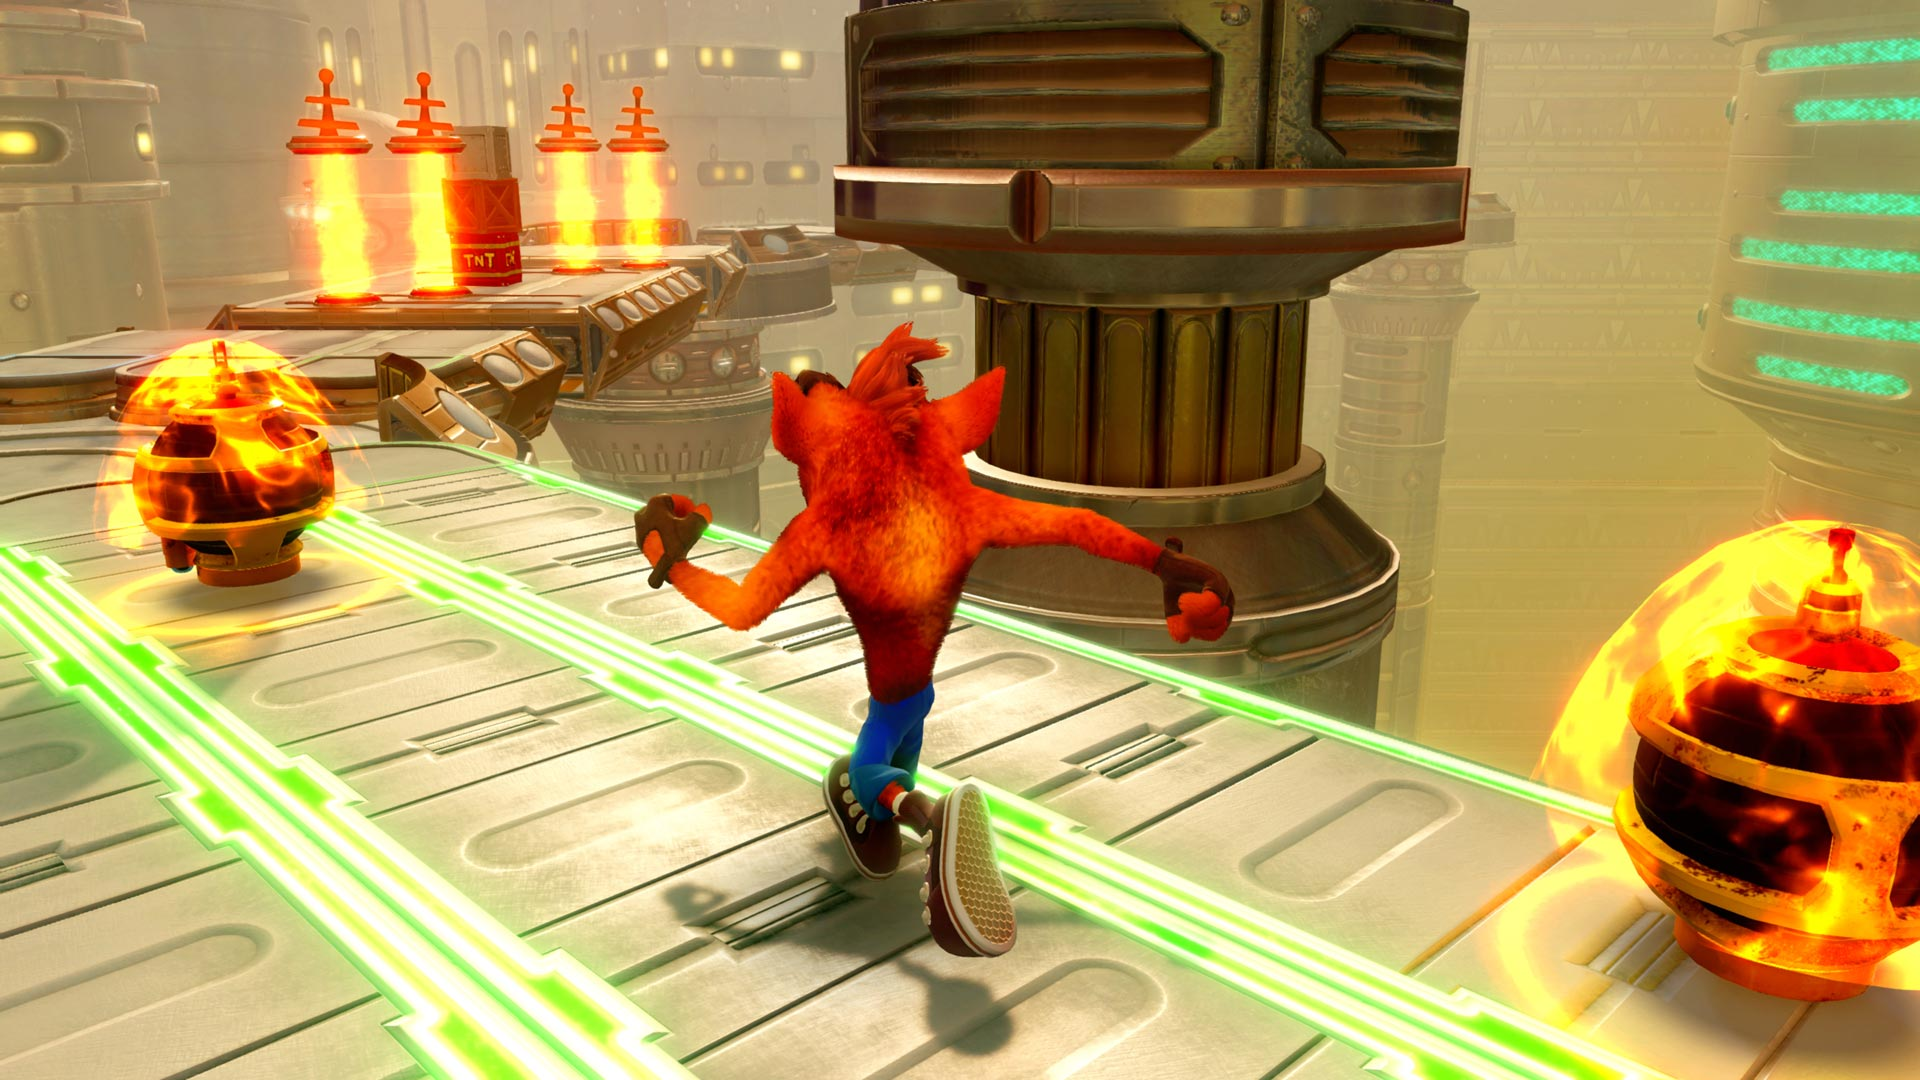 Скриншот №1 к Crash Bandicoot N. Sane Trilogy - эпизод Future Tense